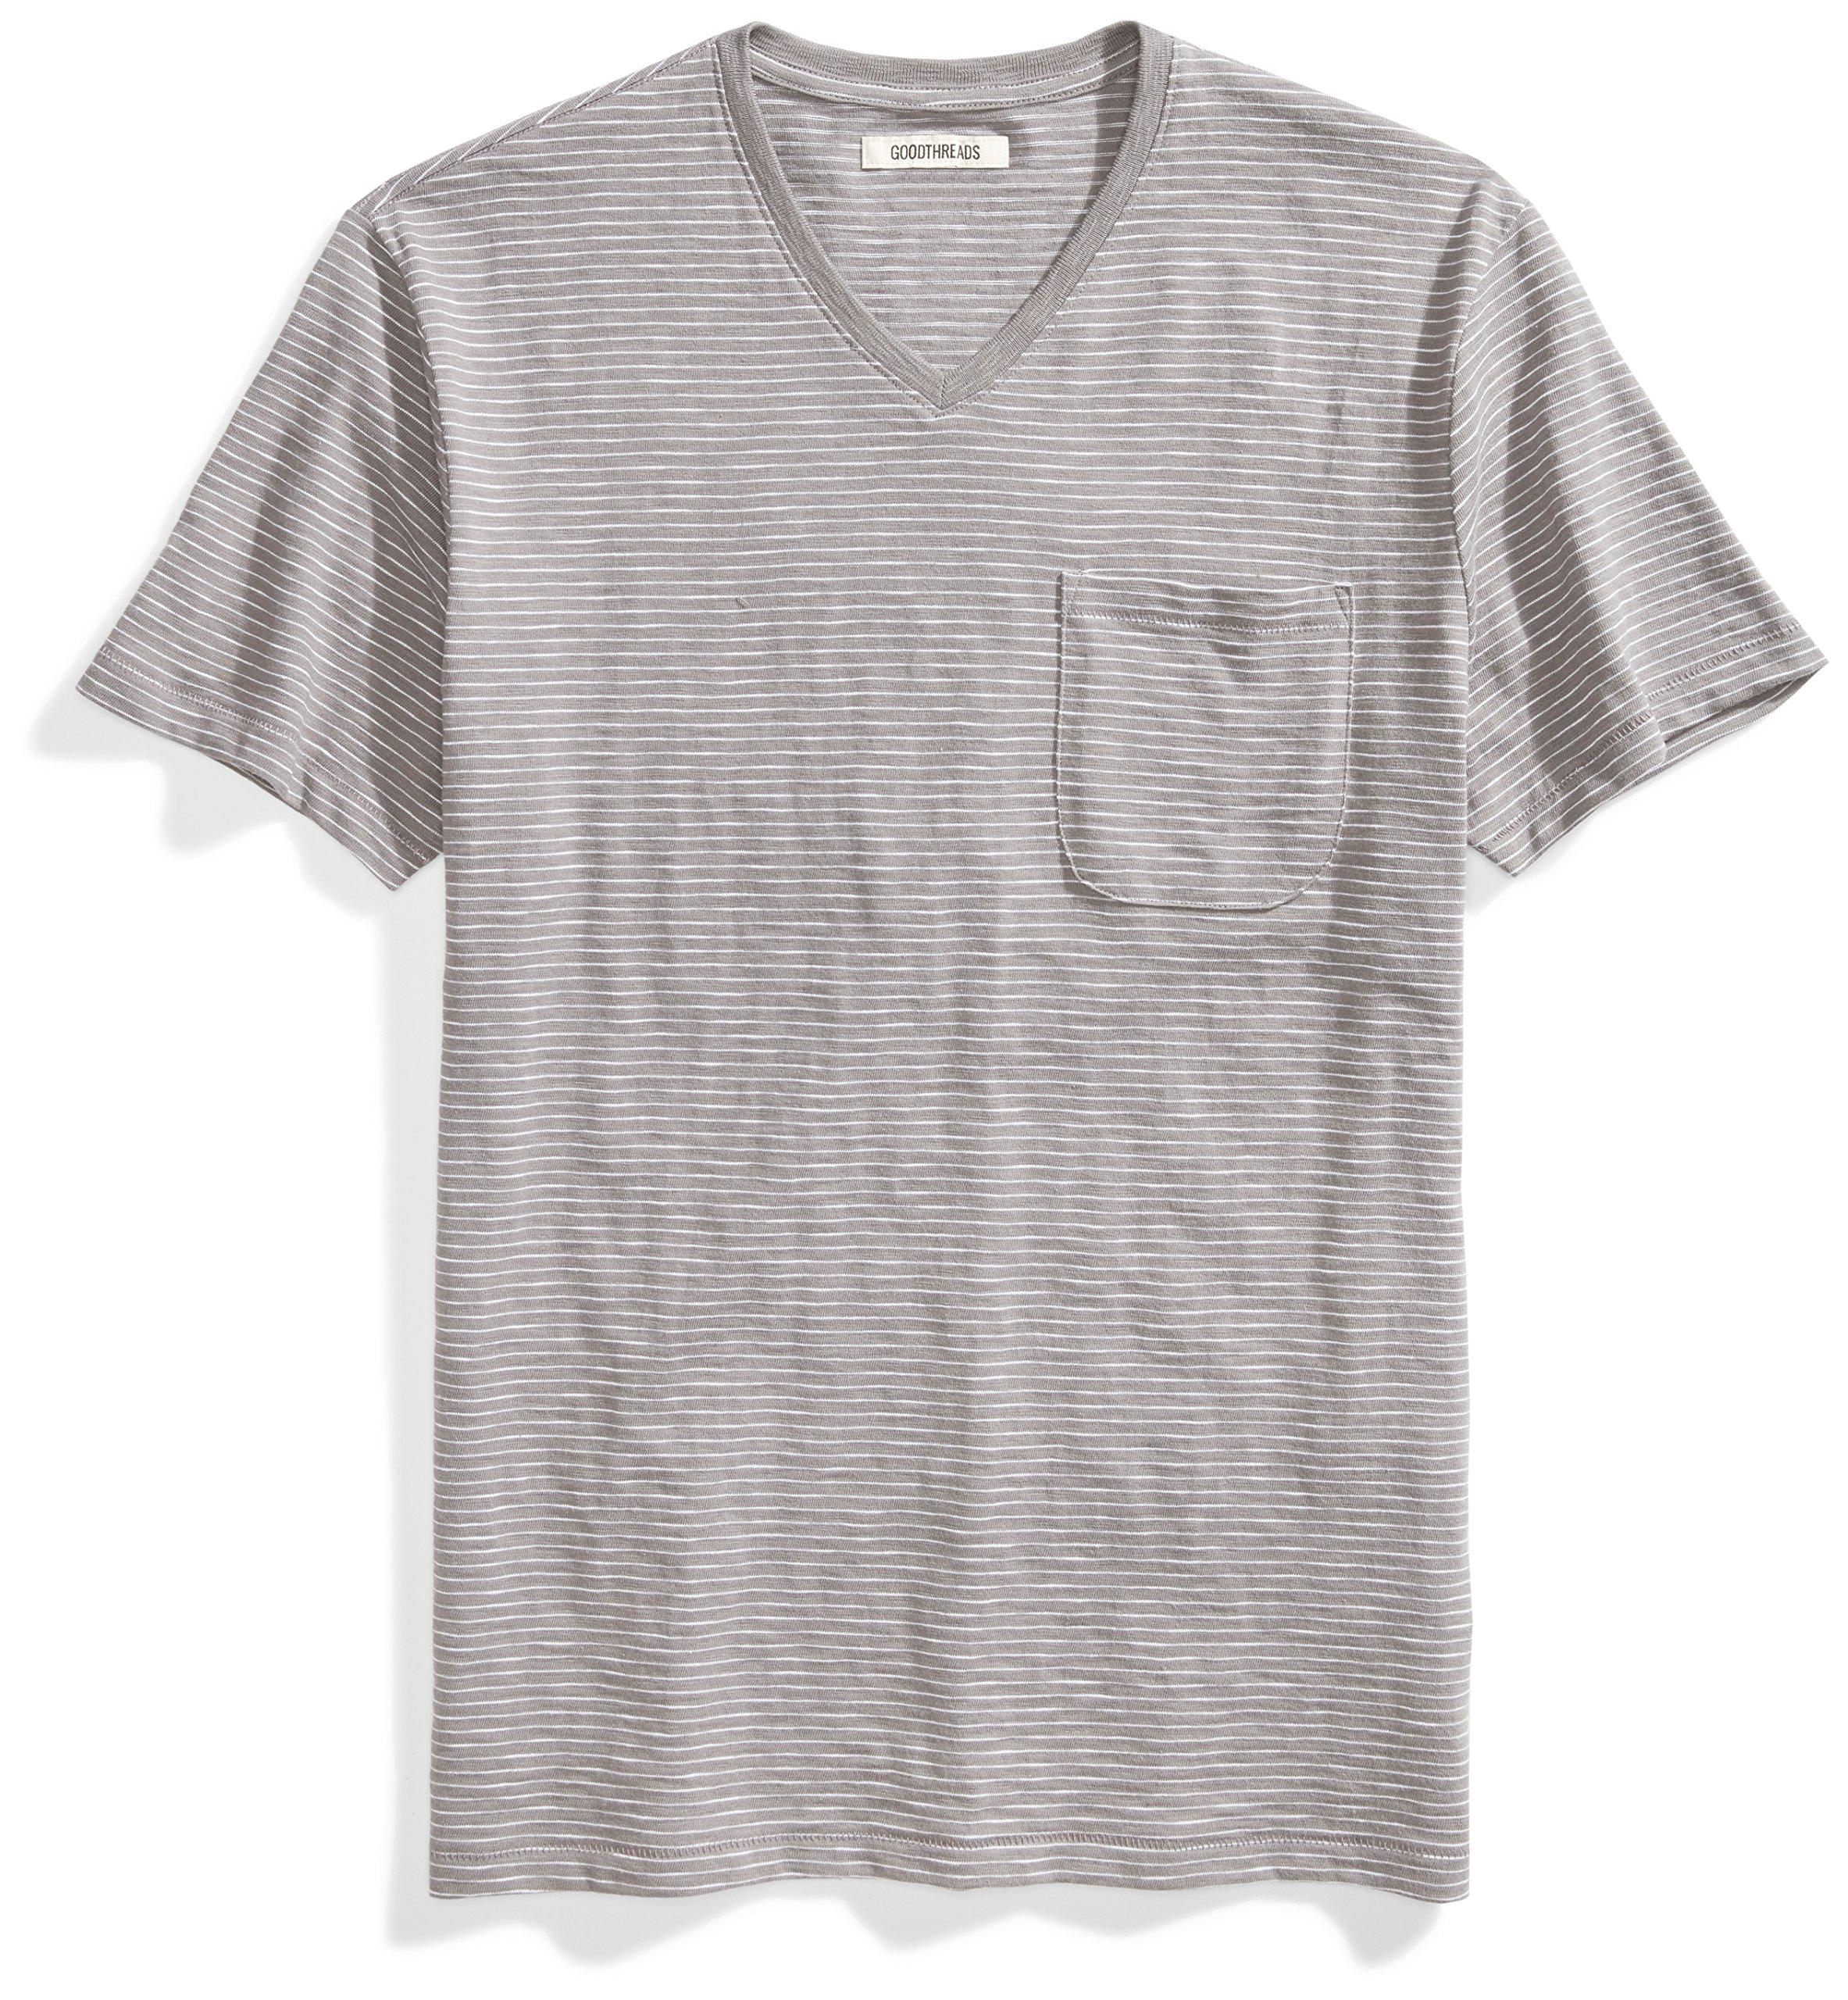 Goodthreads Men's Short-Sleeve V-Neck Striped Slub Pocket T-Shirt, Castle Rock/Grey/White Stripe, Medium